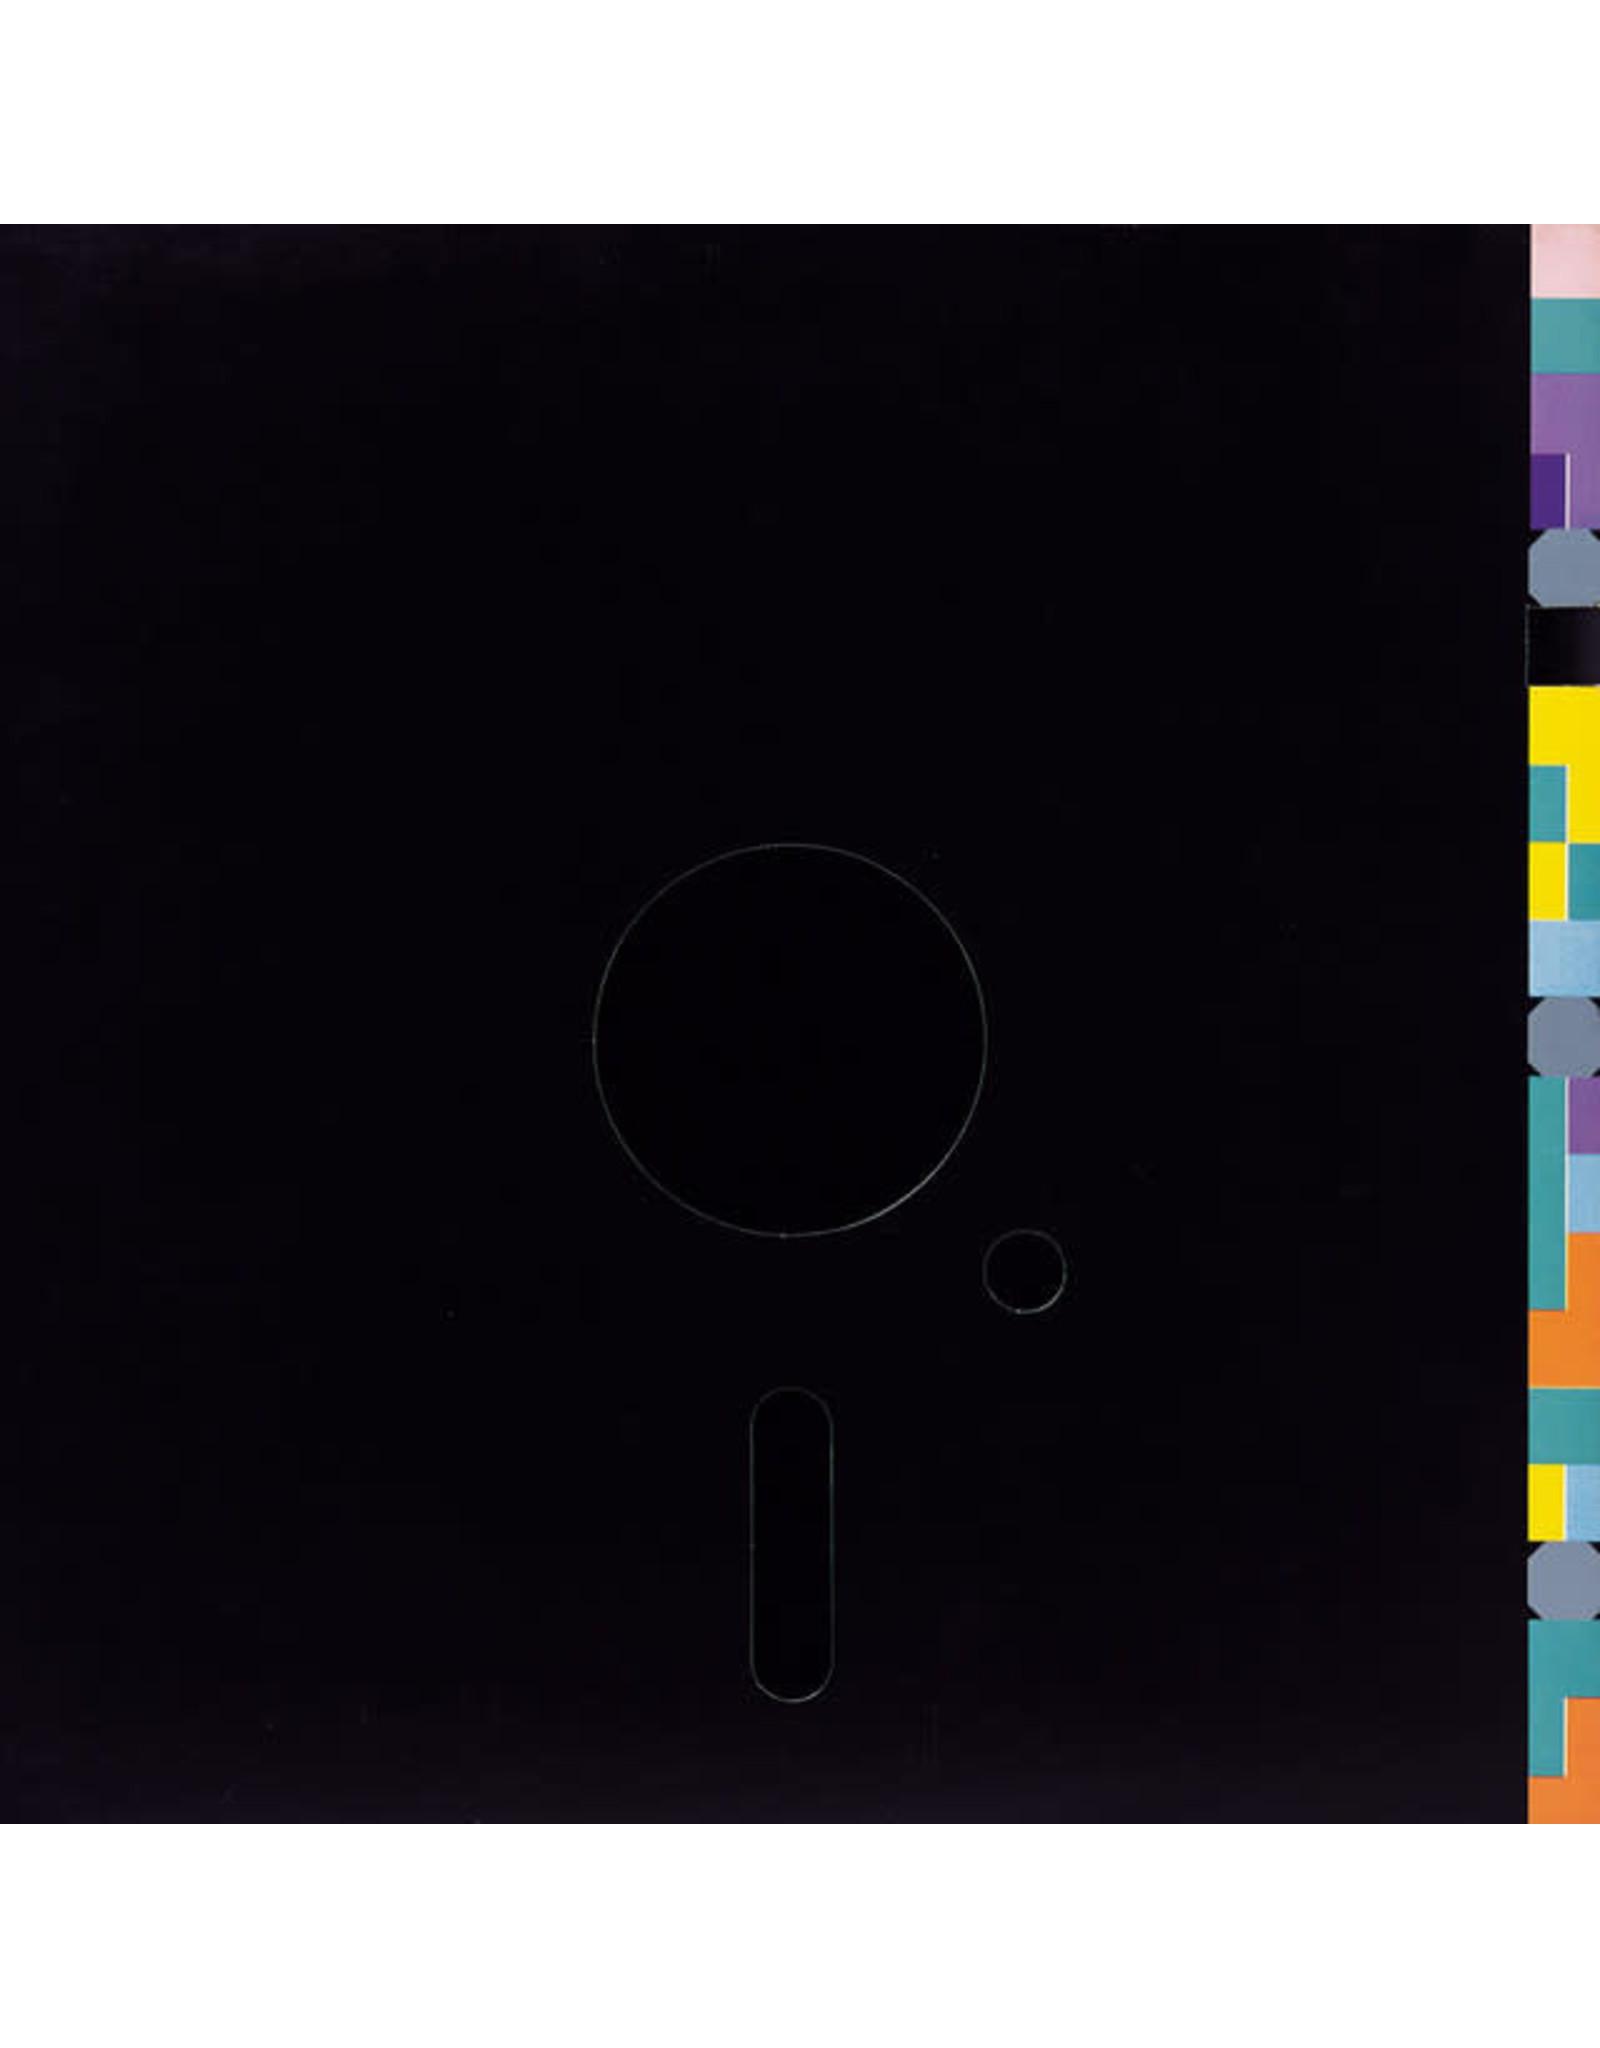 Vinyl New Order - Blue Monday (2020 Remaster) Final Sale